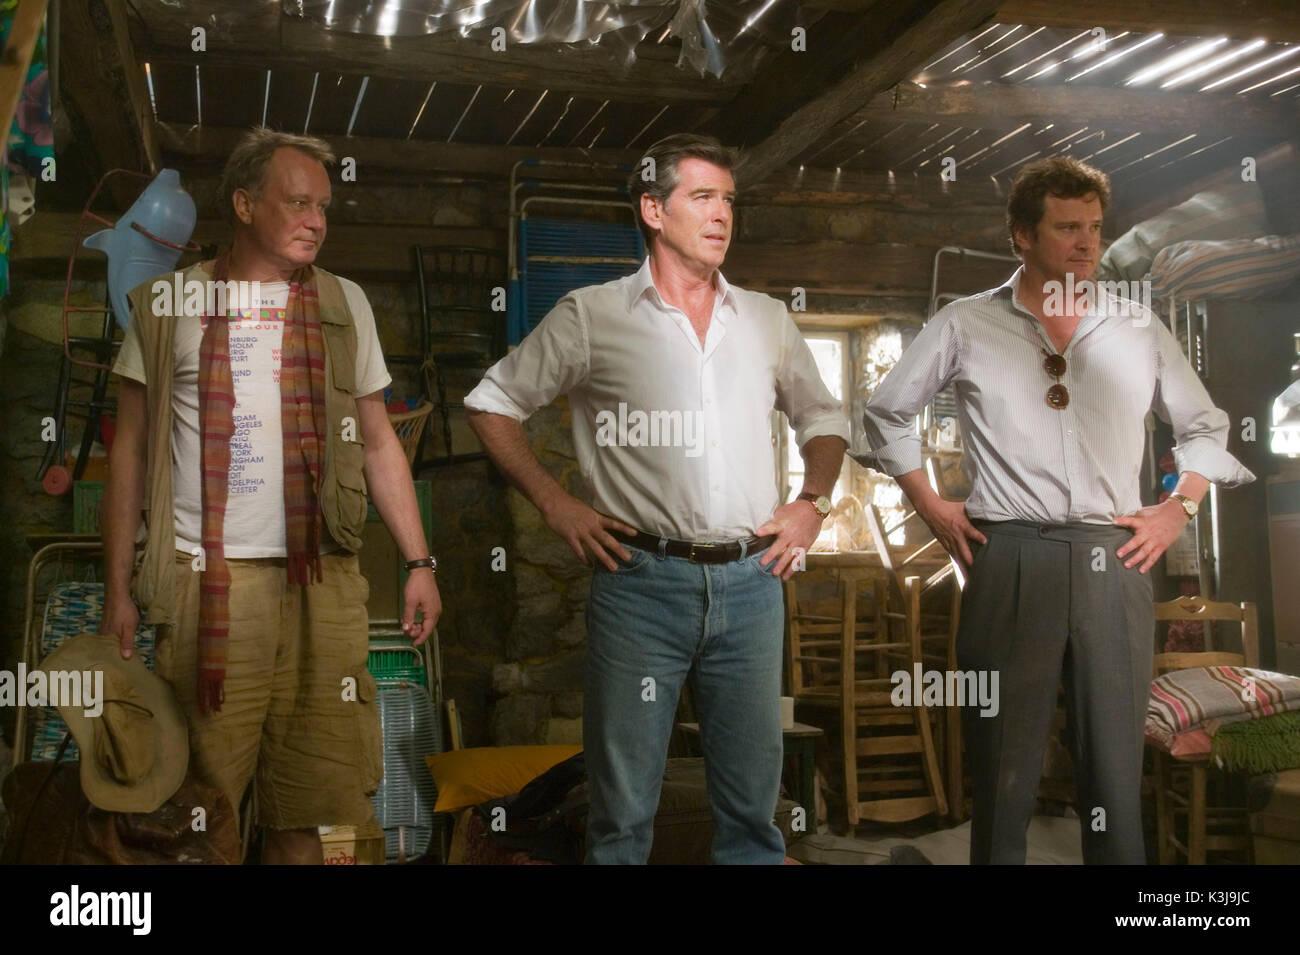 MAMMA MIA! STELLAN SKARSGARD, PIERCE BROSNAN (Sam), Colin Firth (Harry) MAMMA MIA! Datum: 2008 Stockbild